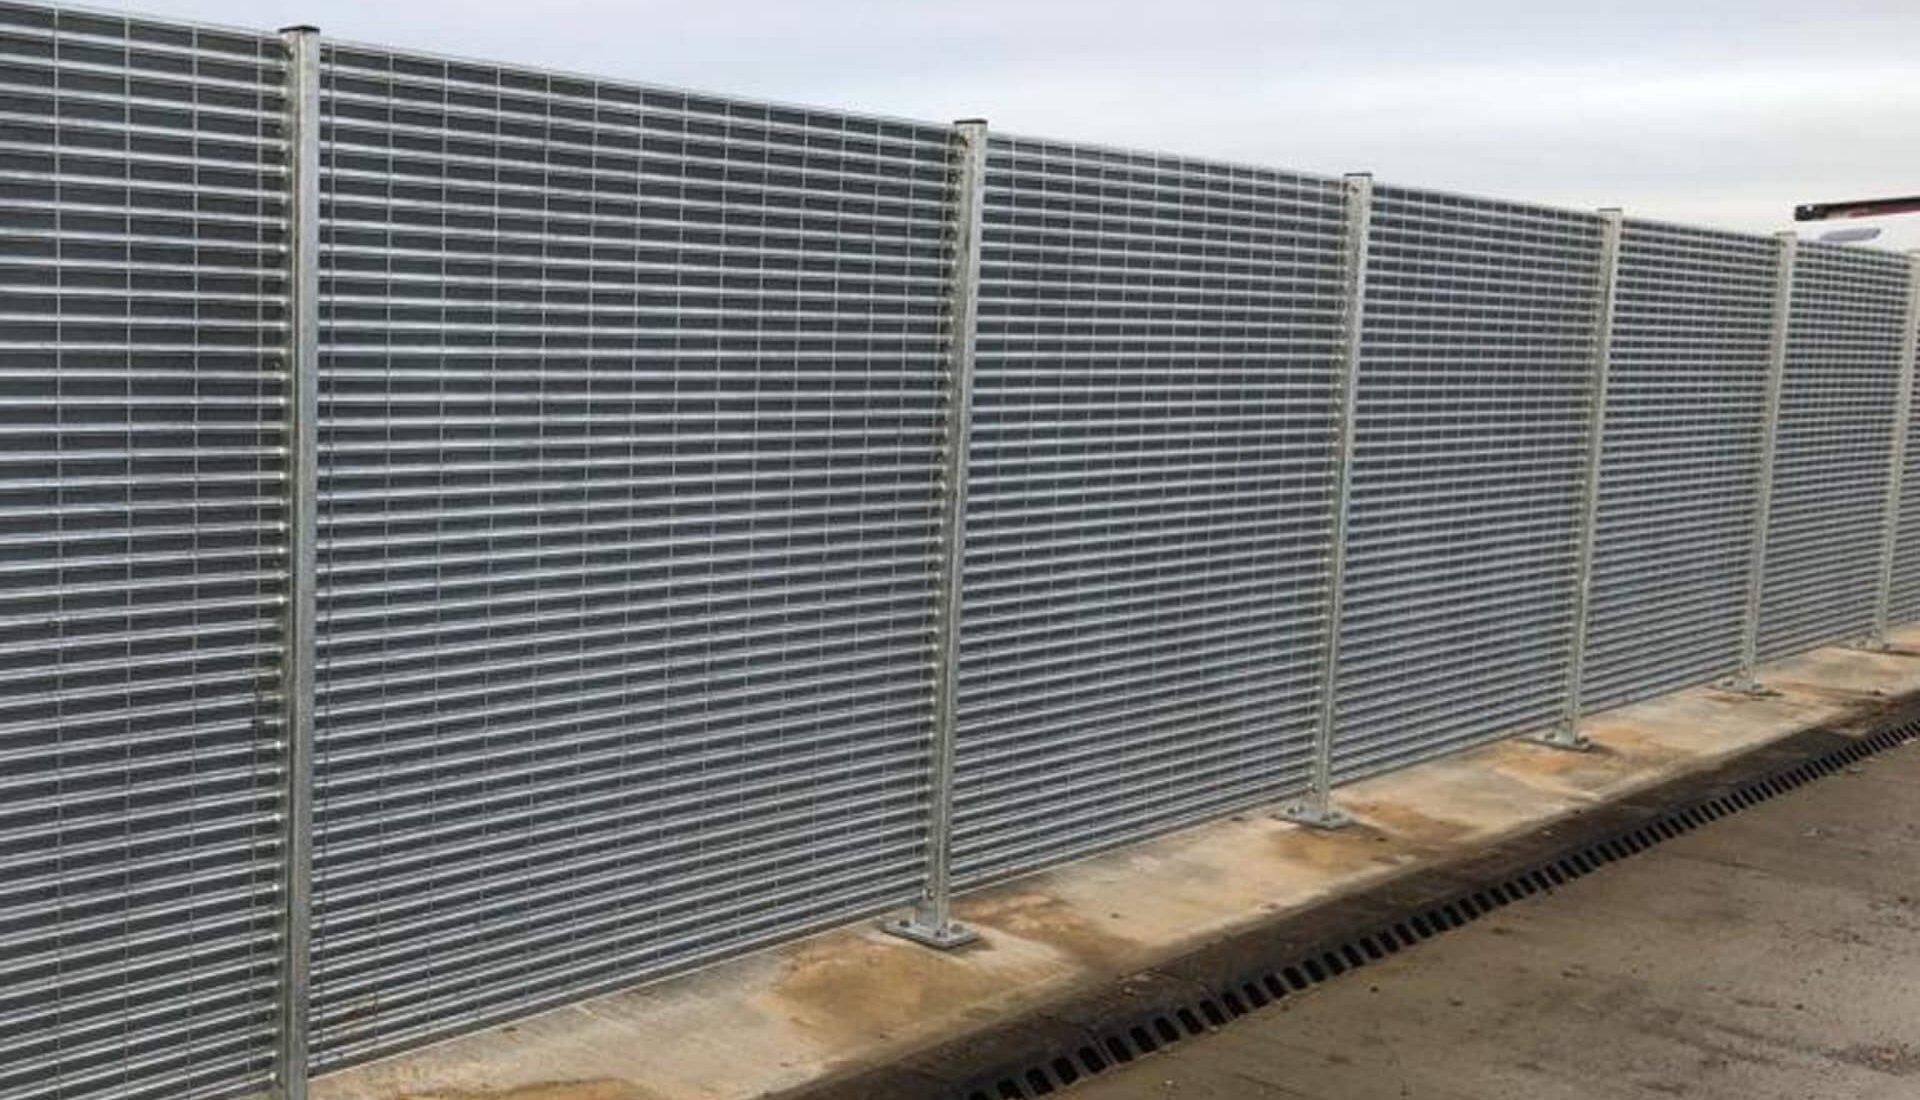 A14 Cambridge to Huntingdon Fence Lourve System